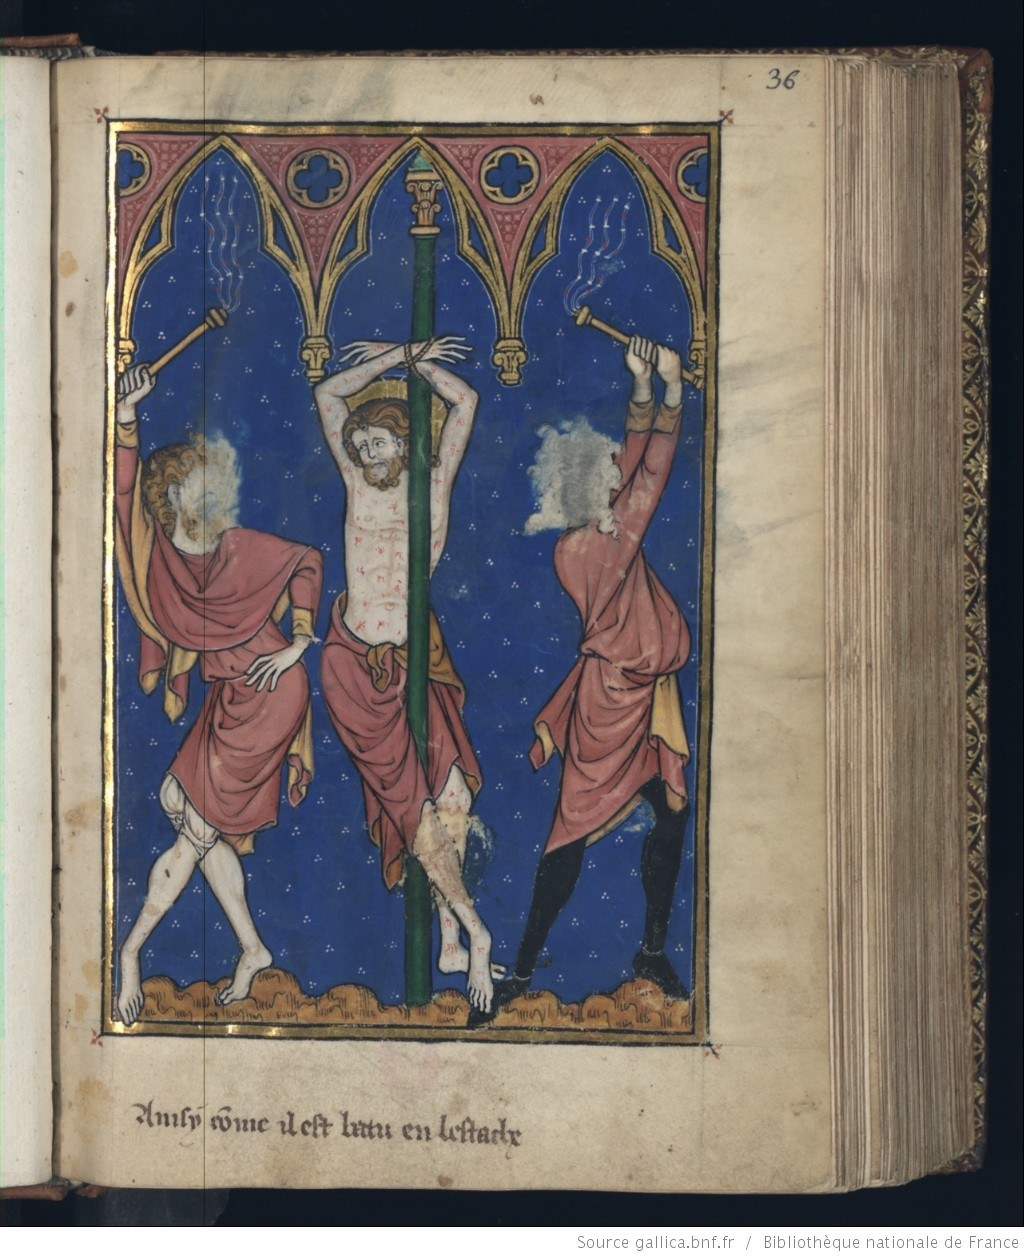 Flaggellation of christ